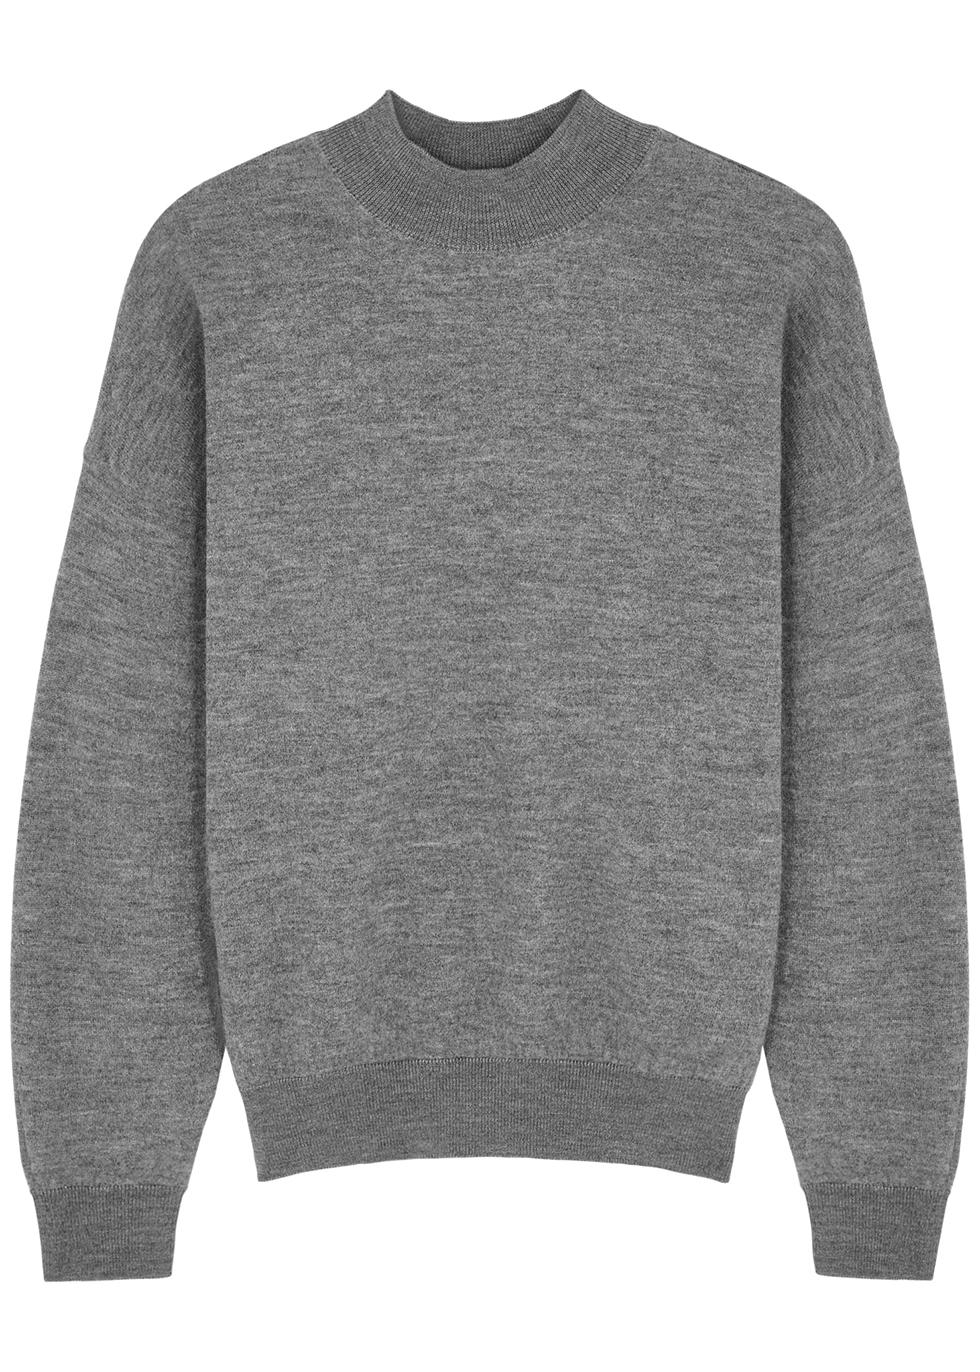 Tadbow pink merino wool jumper